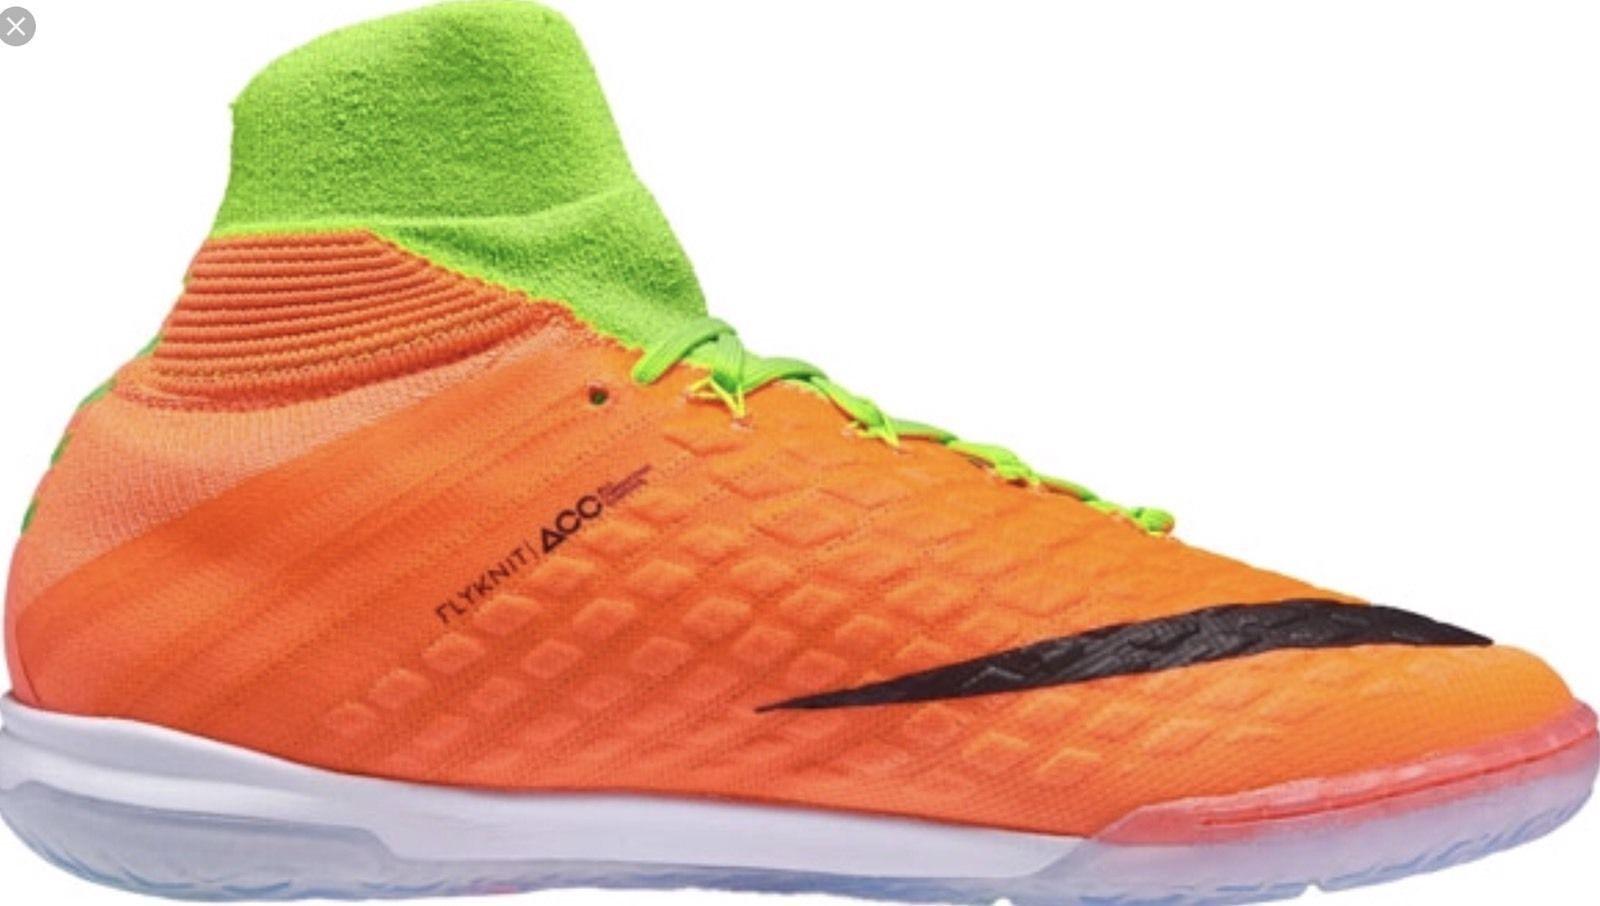 Nike HypervenomX Proximo II DF IC Soccer shoe 852577 308 size 11  RTL 175  NEW